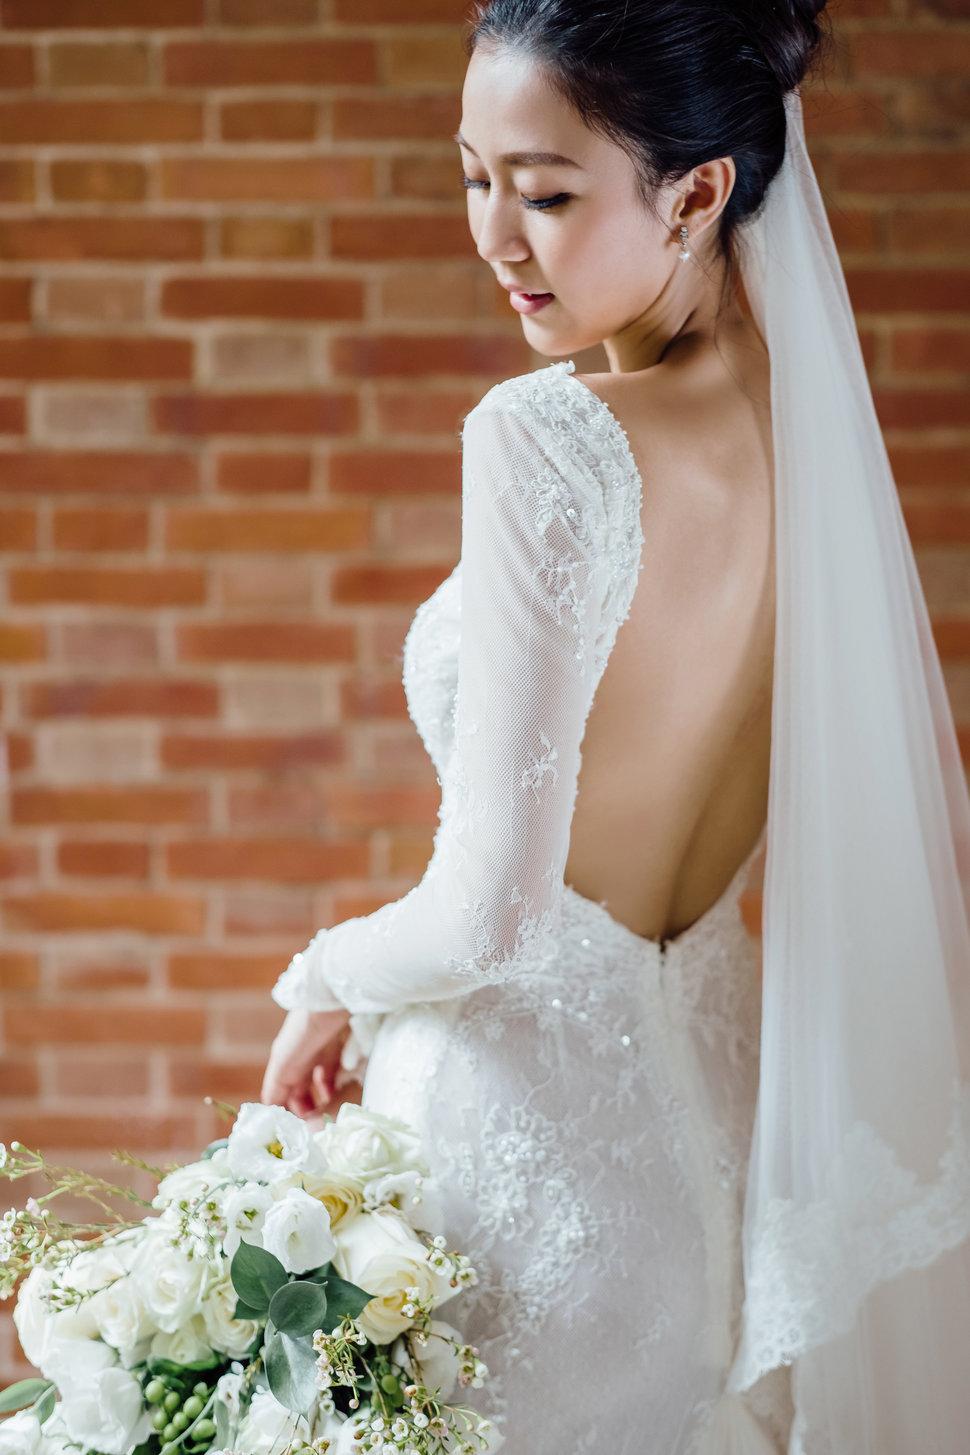 2017-07-22-15h26m56-DSCF5446 - Vicky Li 新娘秘書《結婚吧》